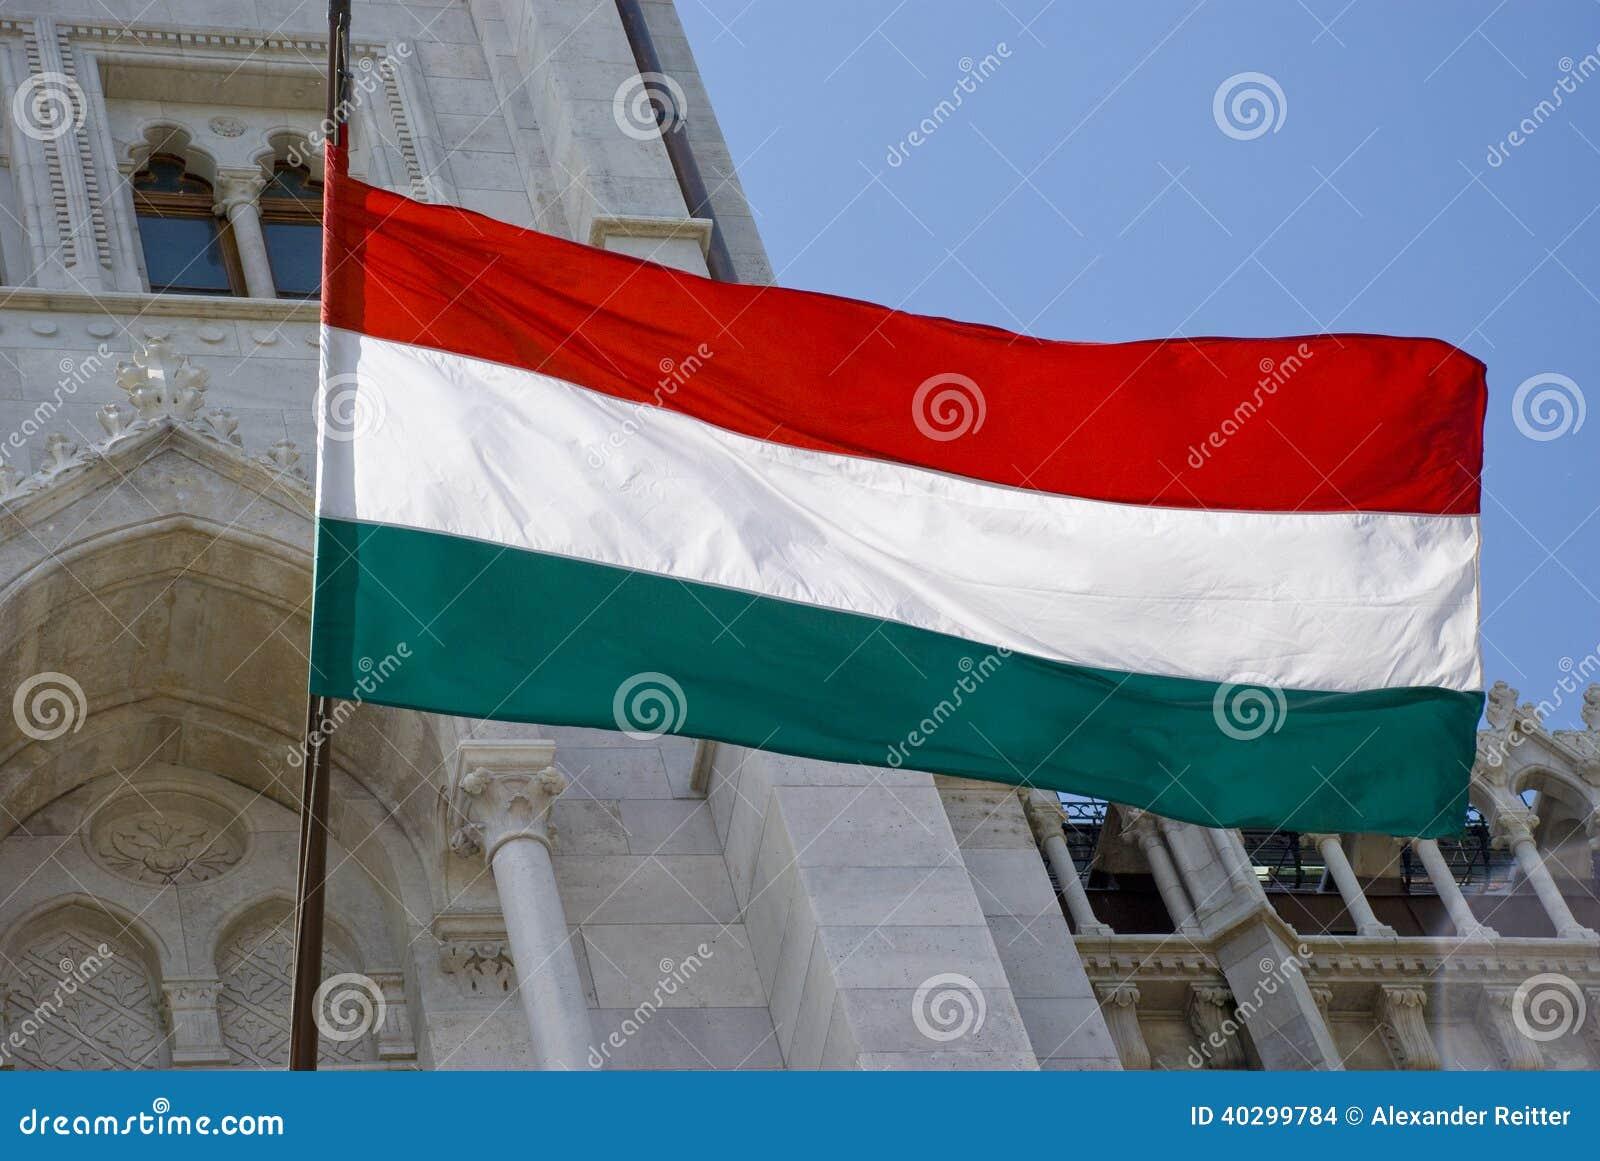 ungarische flagge ungarn archivbilder abgabe des. Black Bedroom Furniture Sets. Home Design Ideas